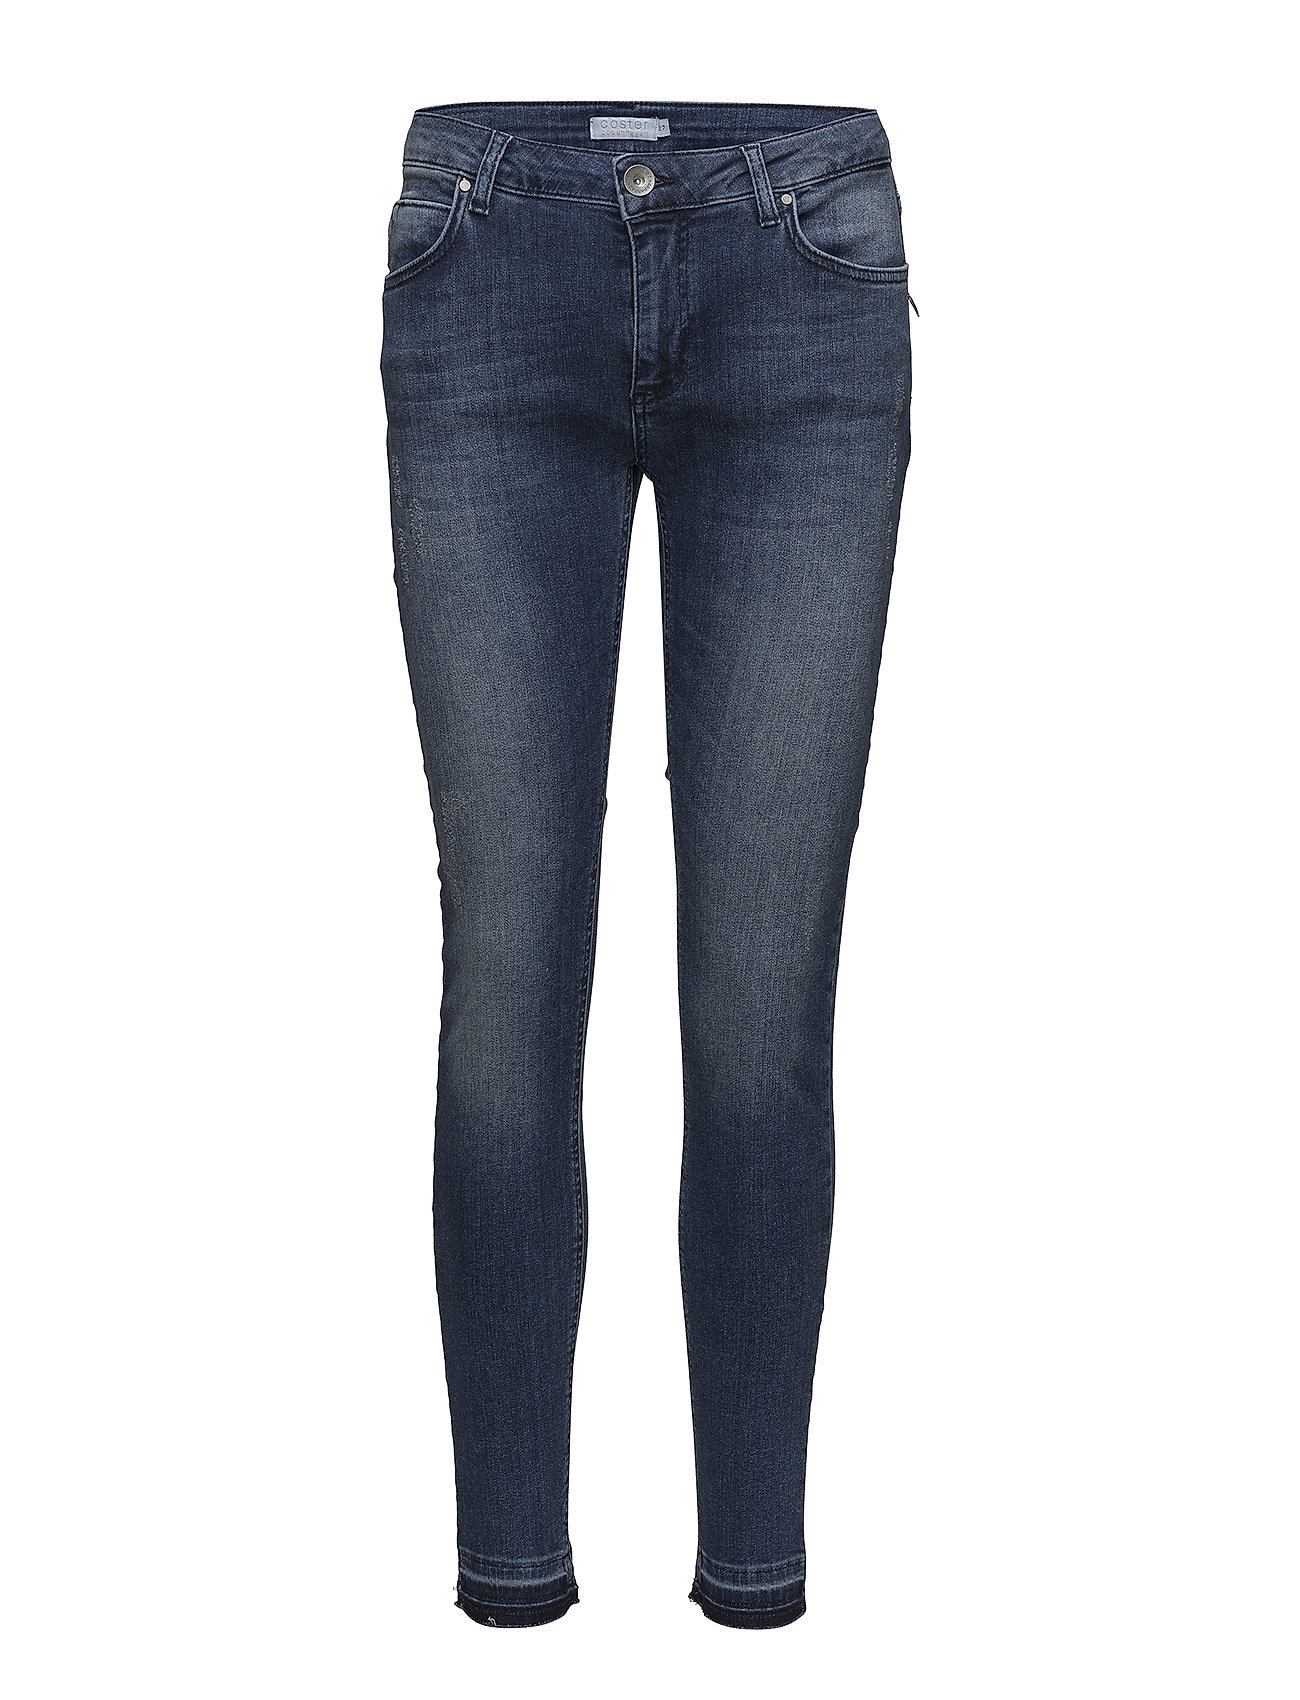 Coster Copenhagen Slim fit jeans w. raw edges Jeans